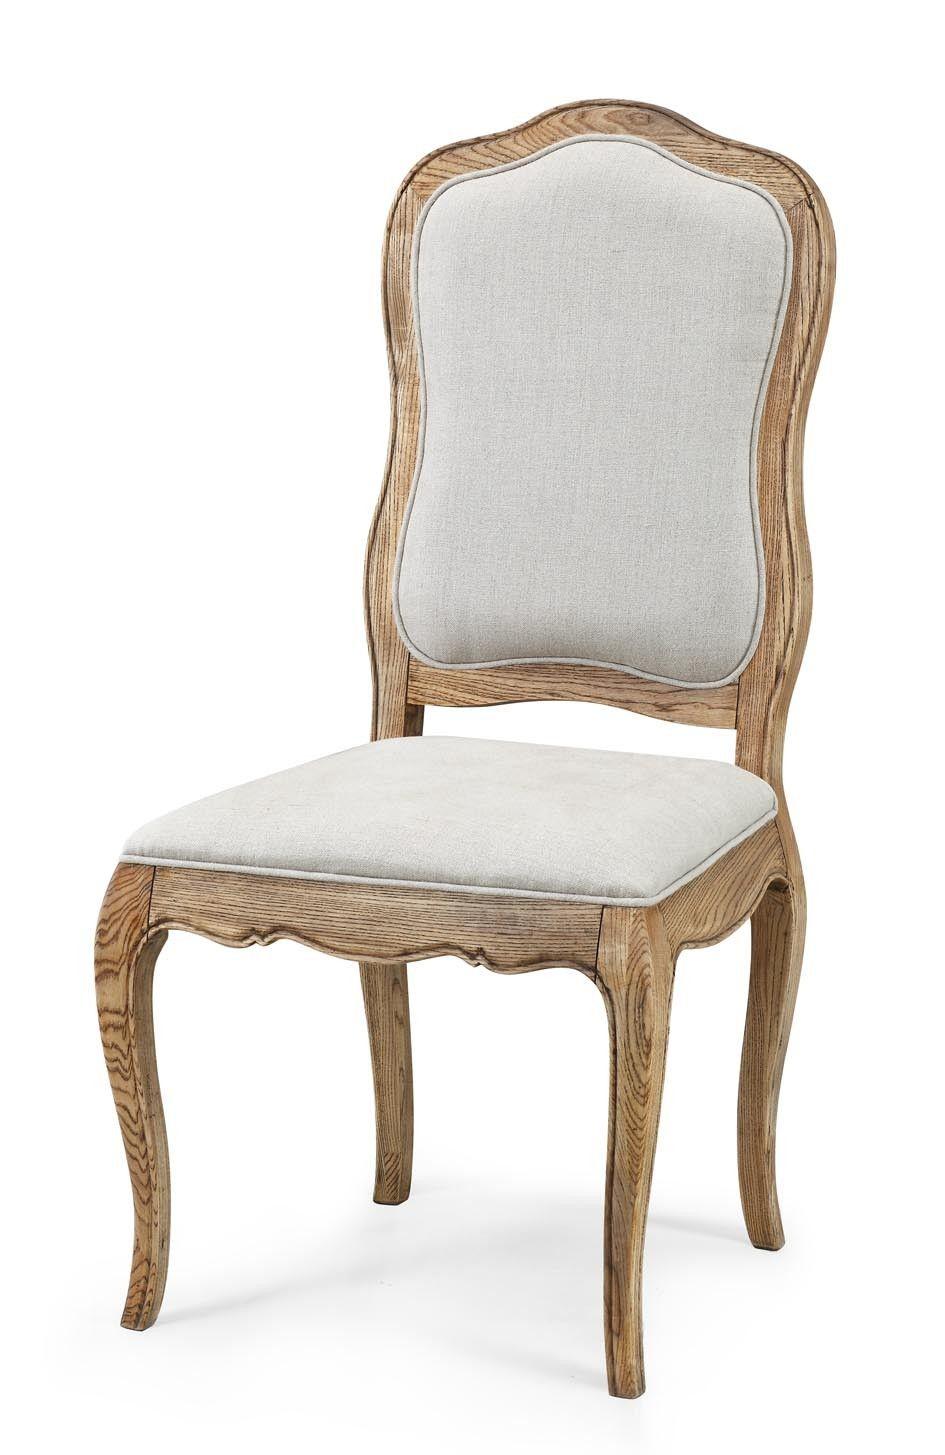 Attrayant French Provincial   Google Search Oak Ottomans, French Provincial Chair,  Oak Dining Chairs,